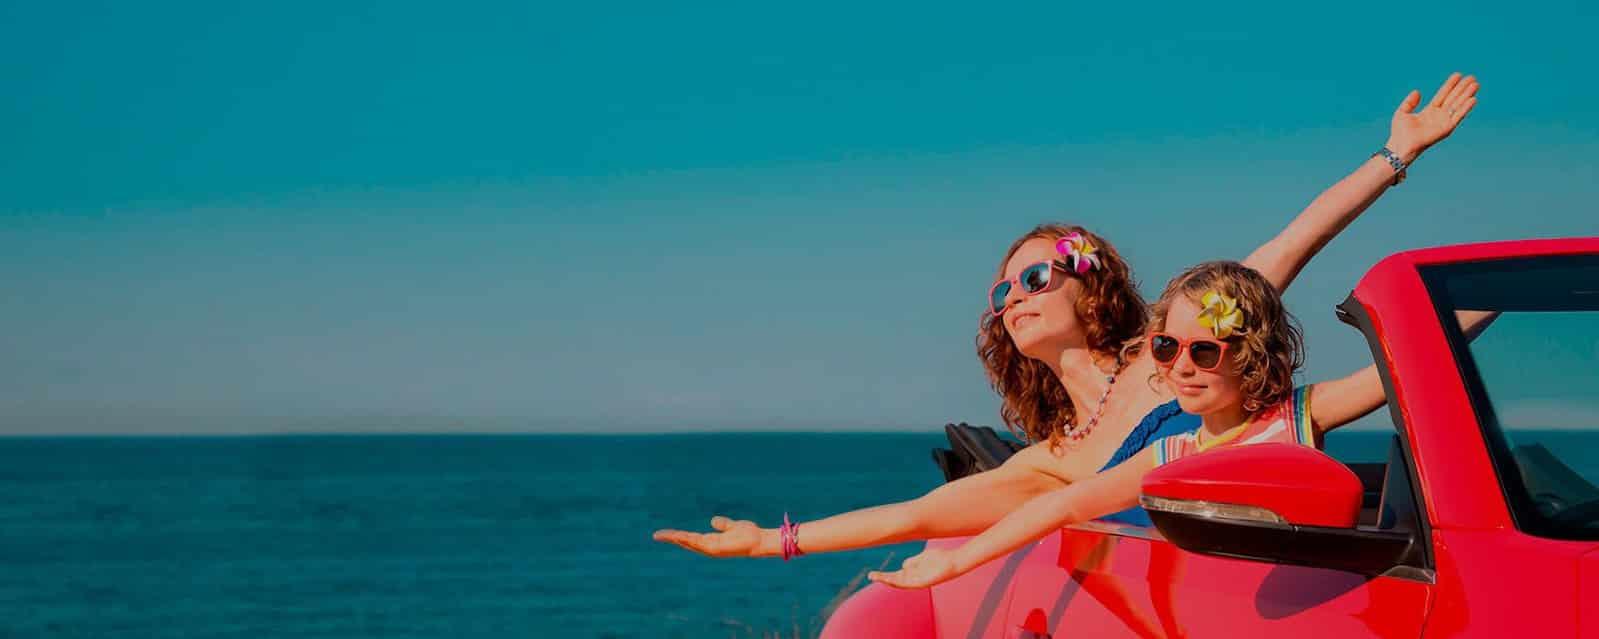 Alquiler de coches en Menorca sin franquicia